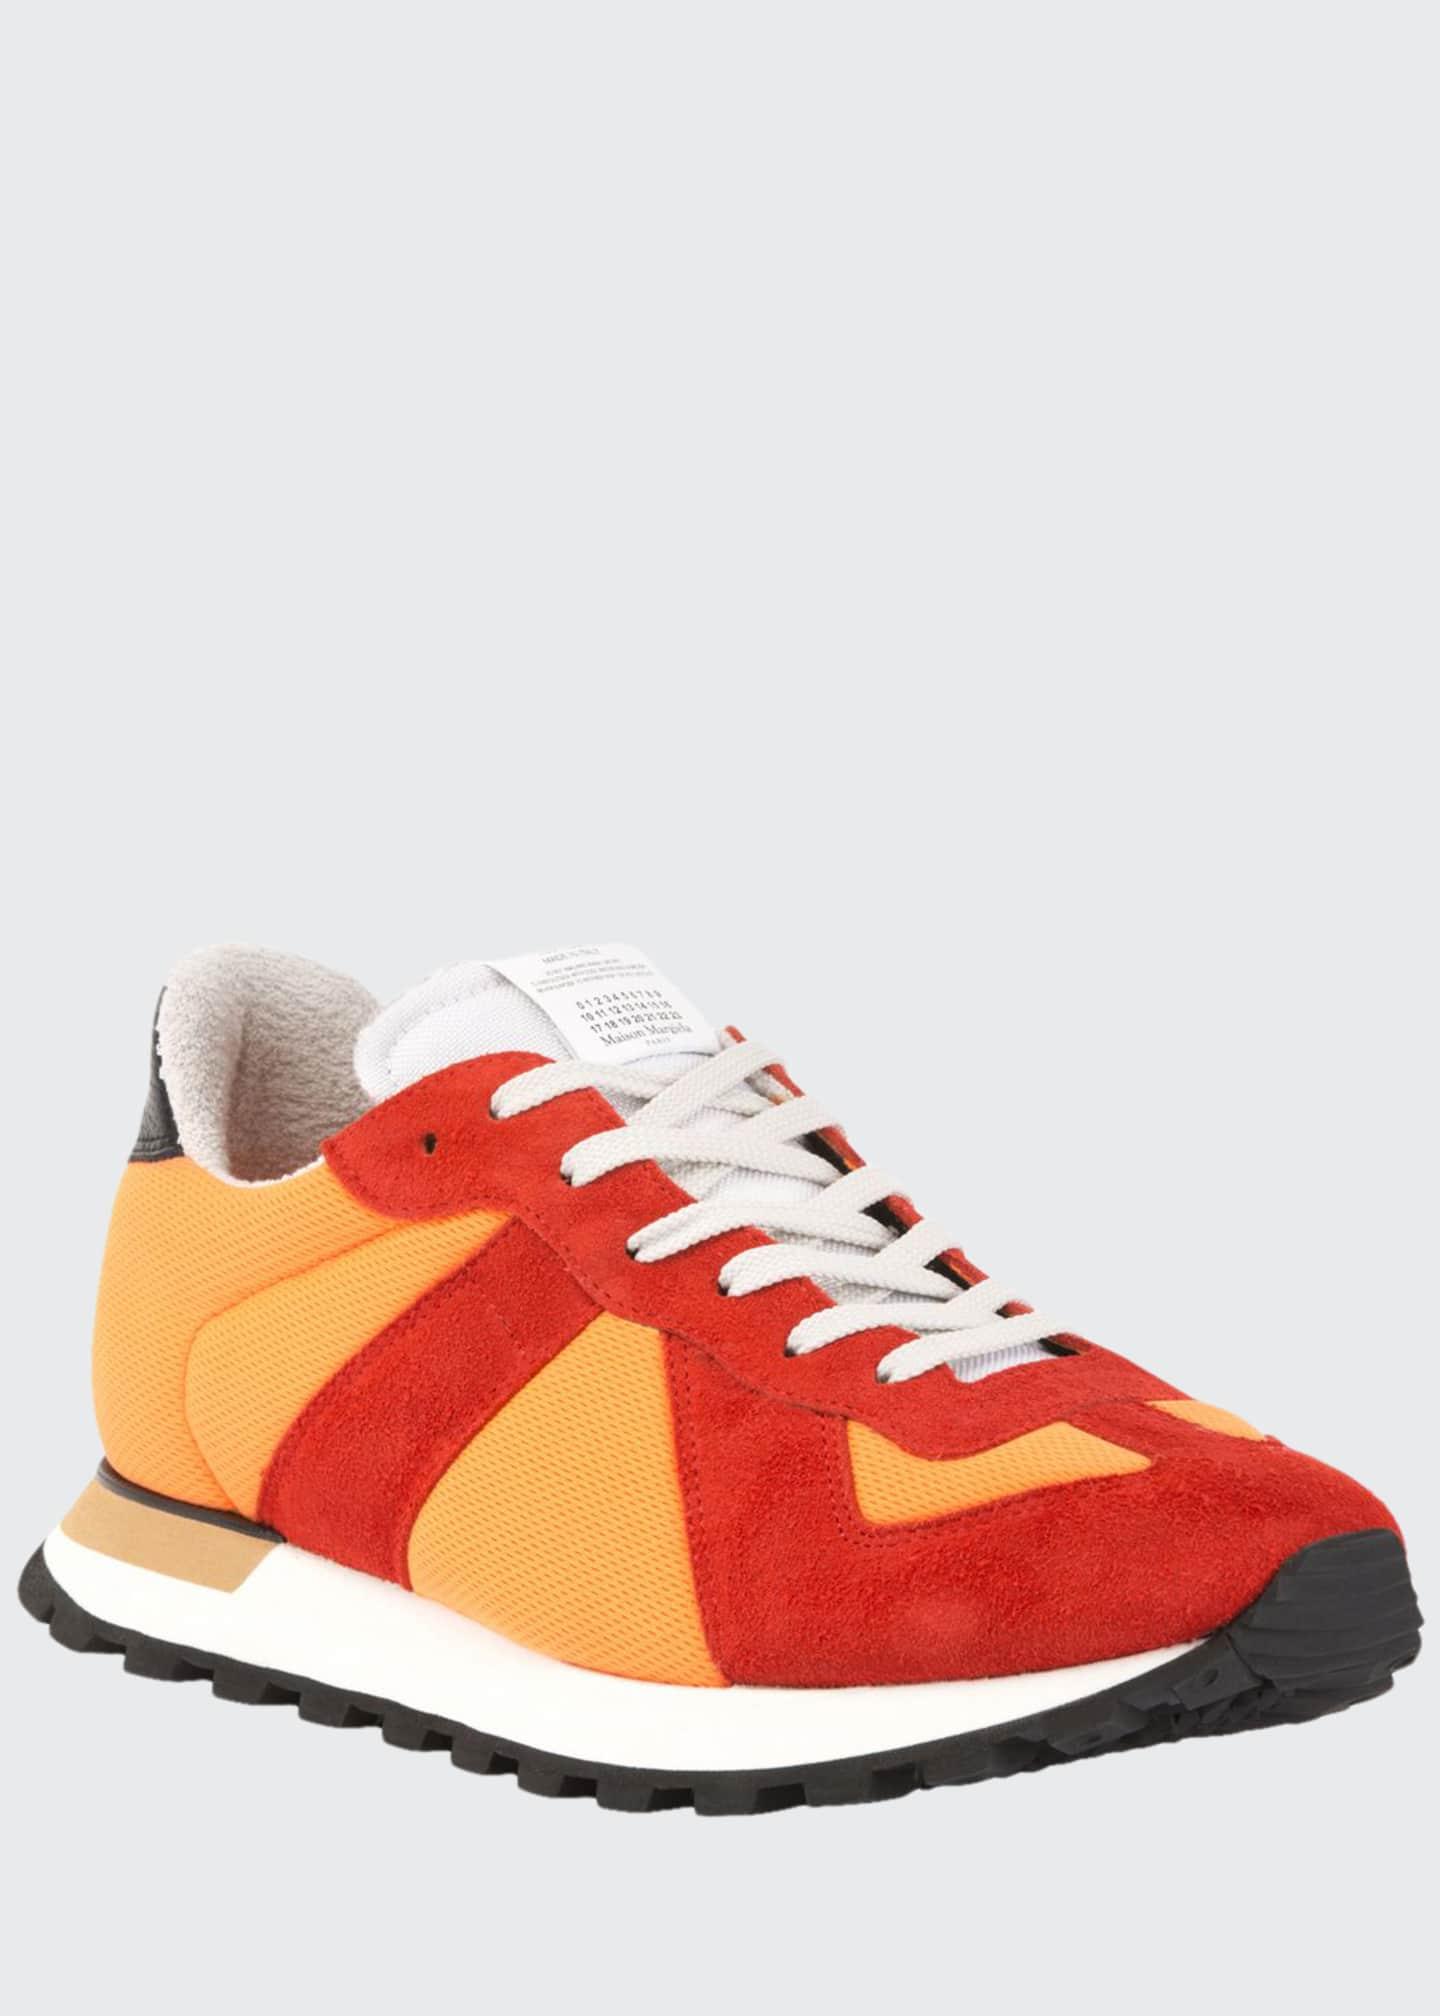 Maison Margiela Men's Replica Nylon & Suede Sneakers,